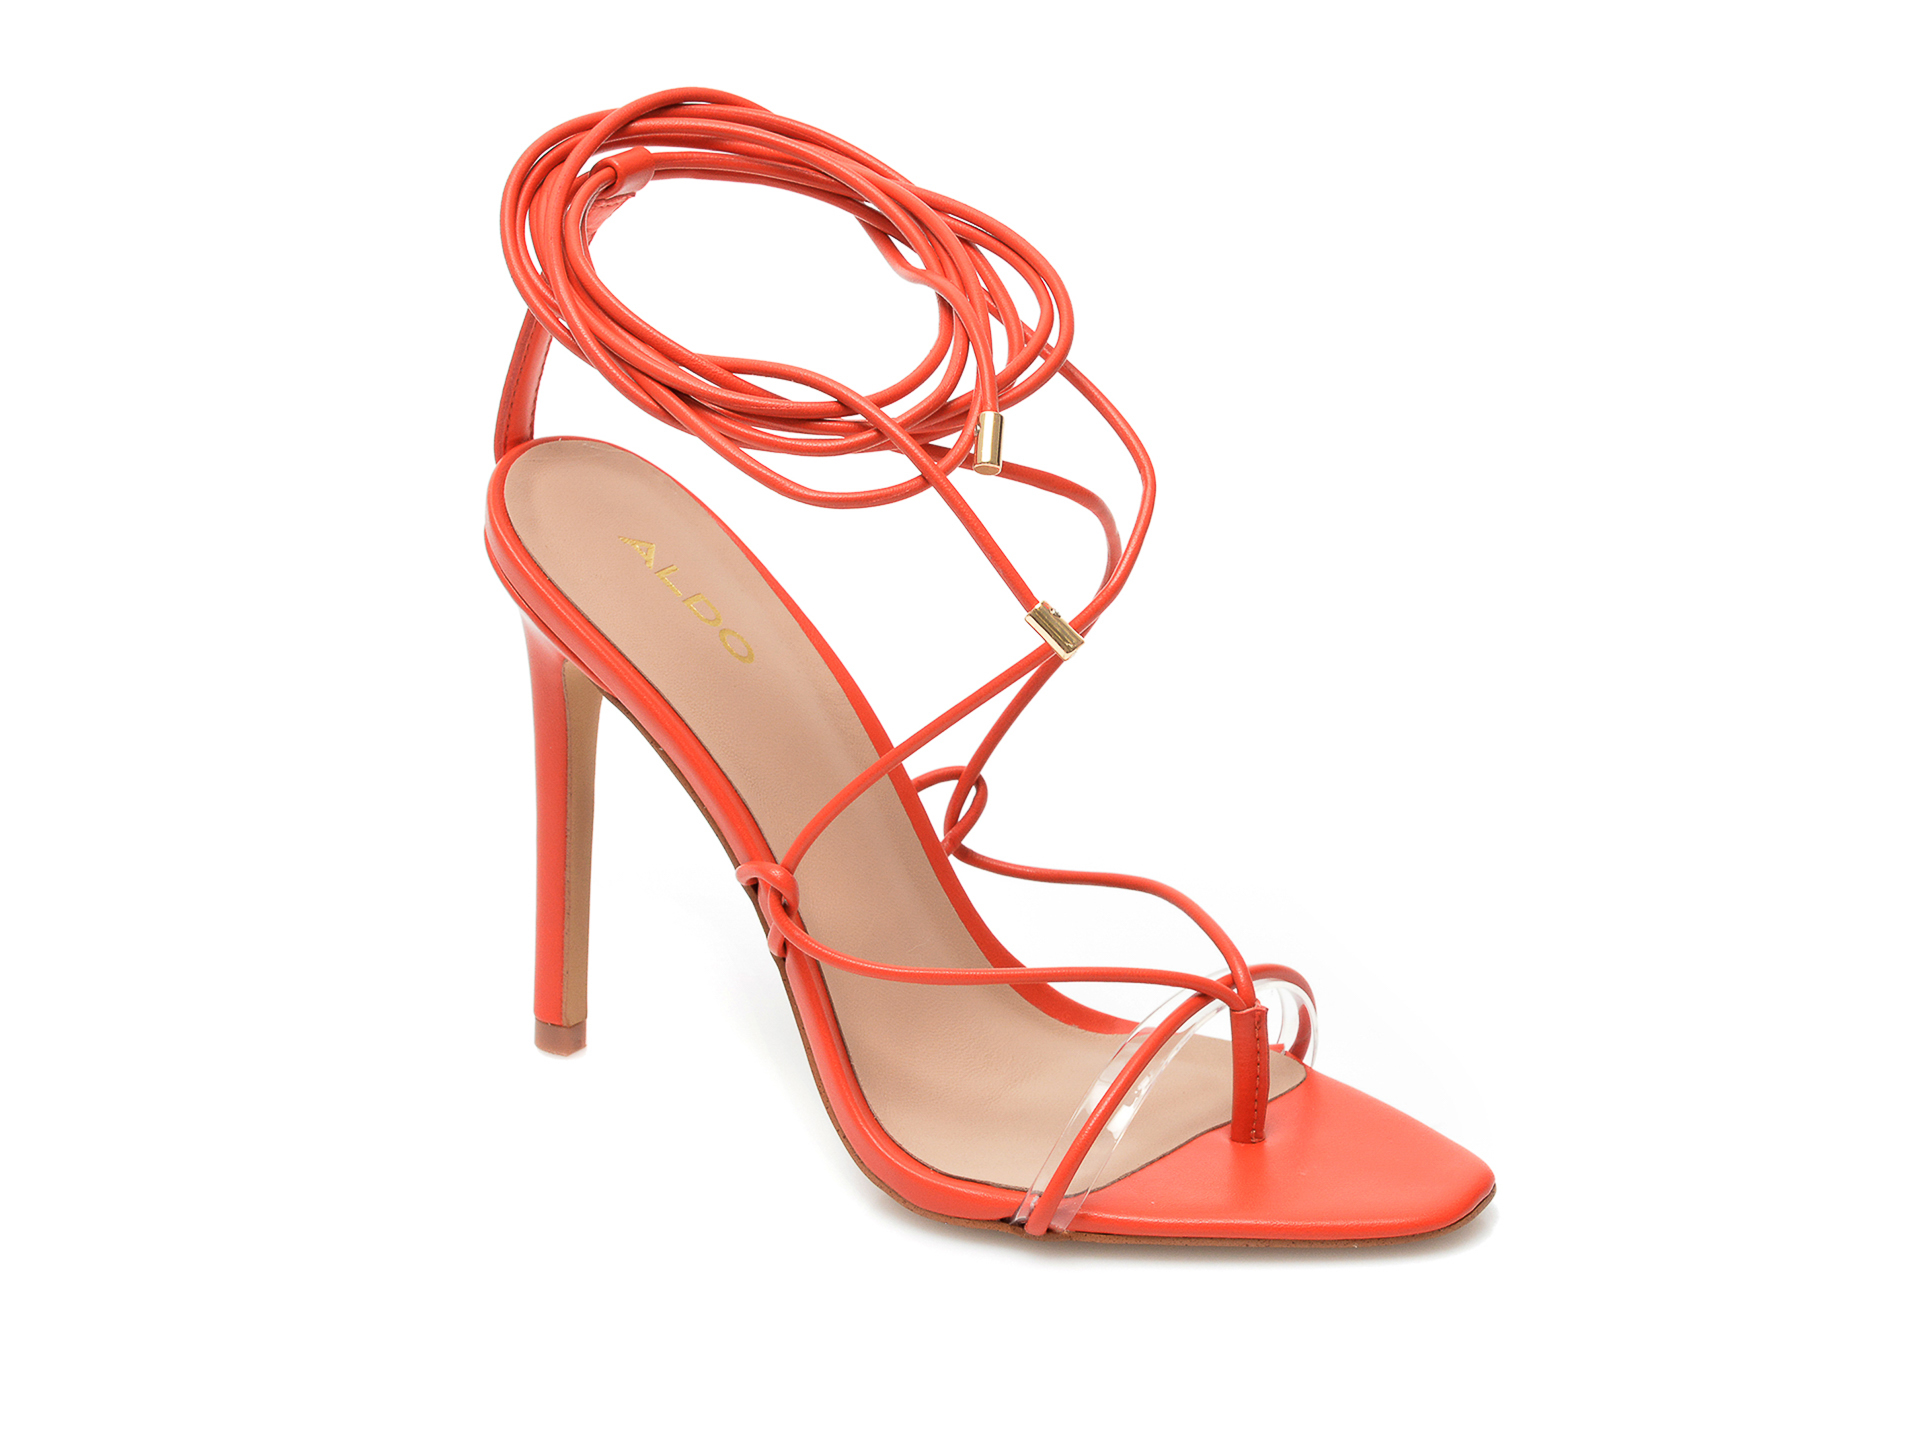 Sandale ALDO rosii, Glaosa800, din piele ecologica imagine otter.ro 2021